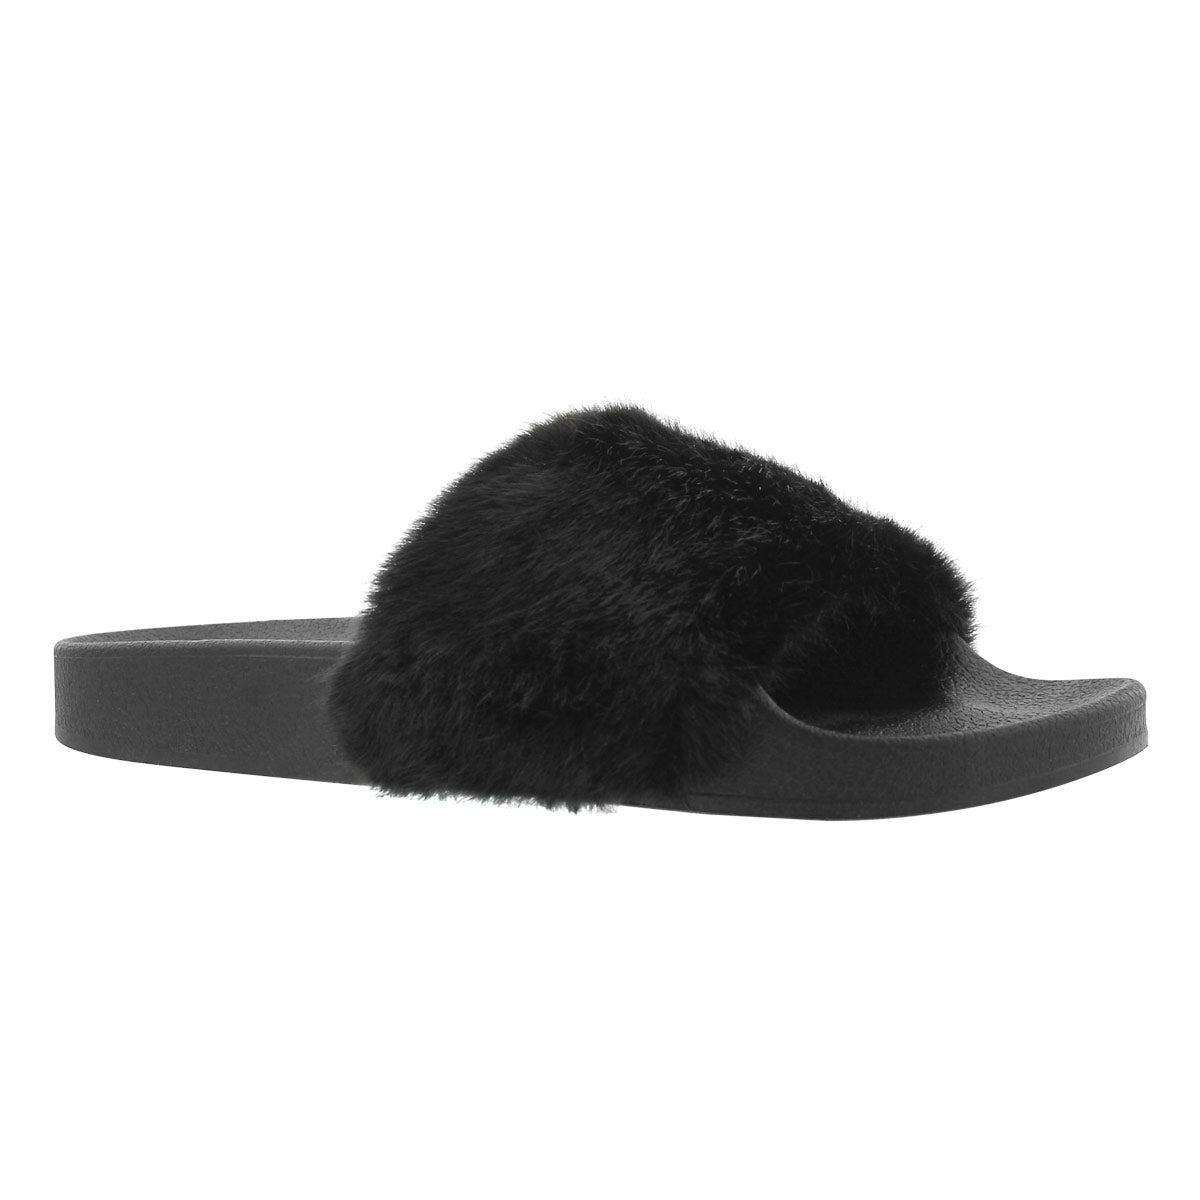 a9181429e82 Steve Madden Women s SOFTEY black faux fur sl